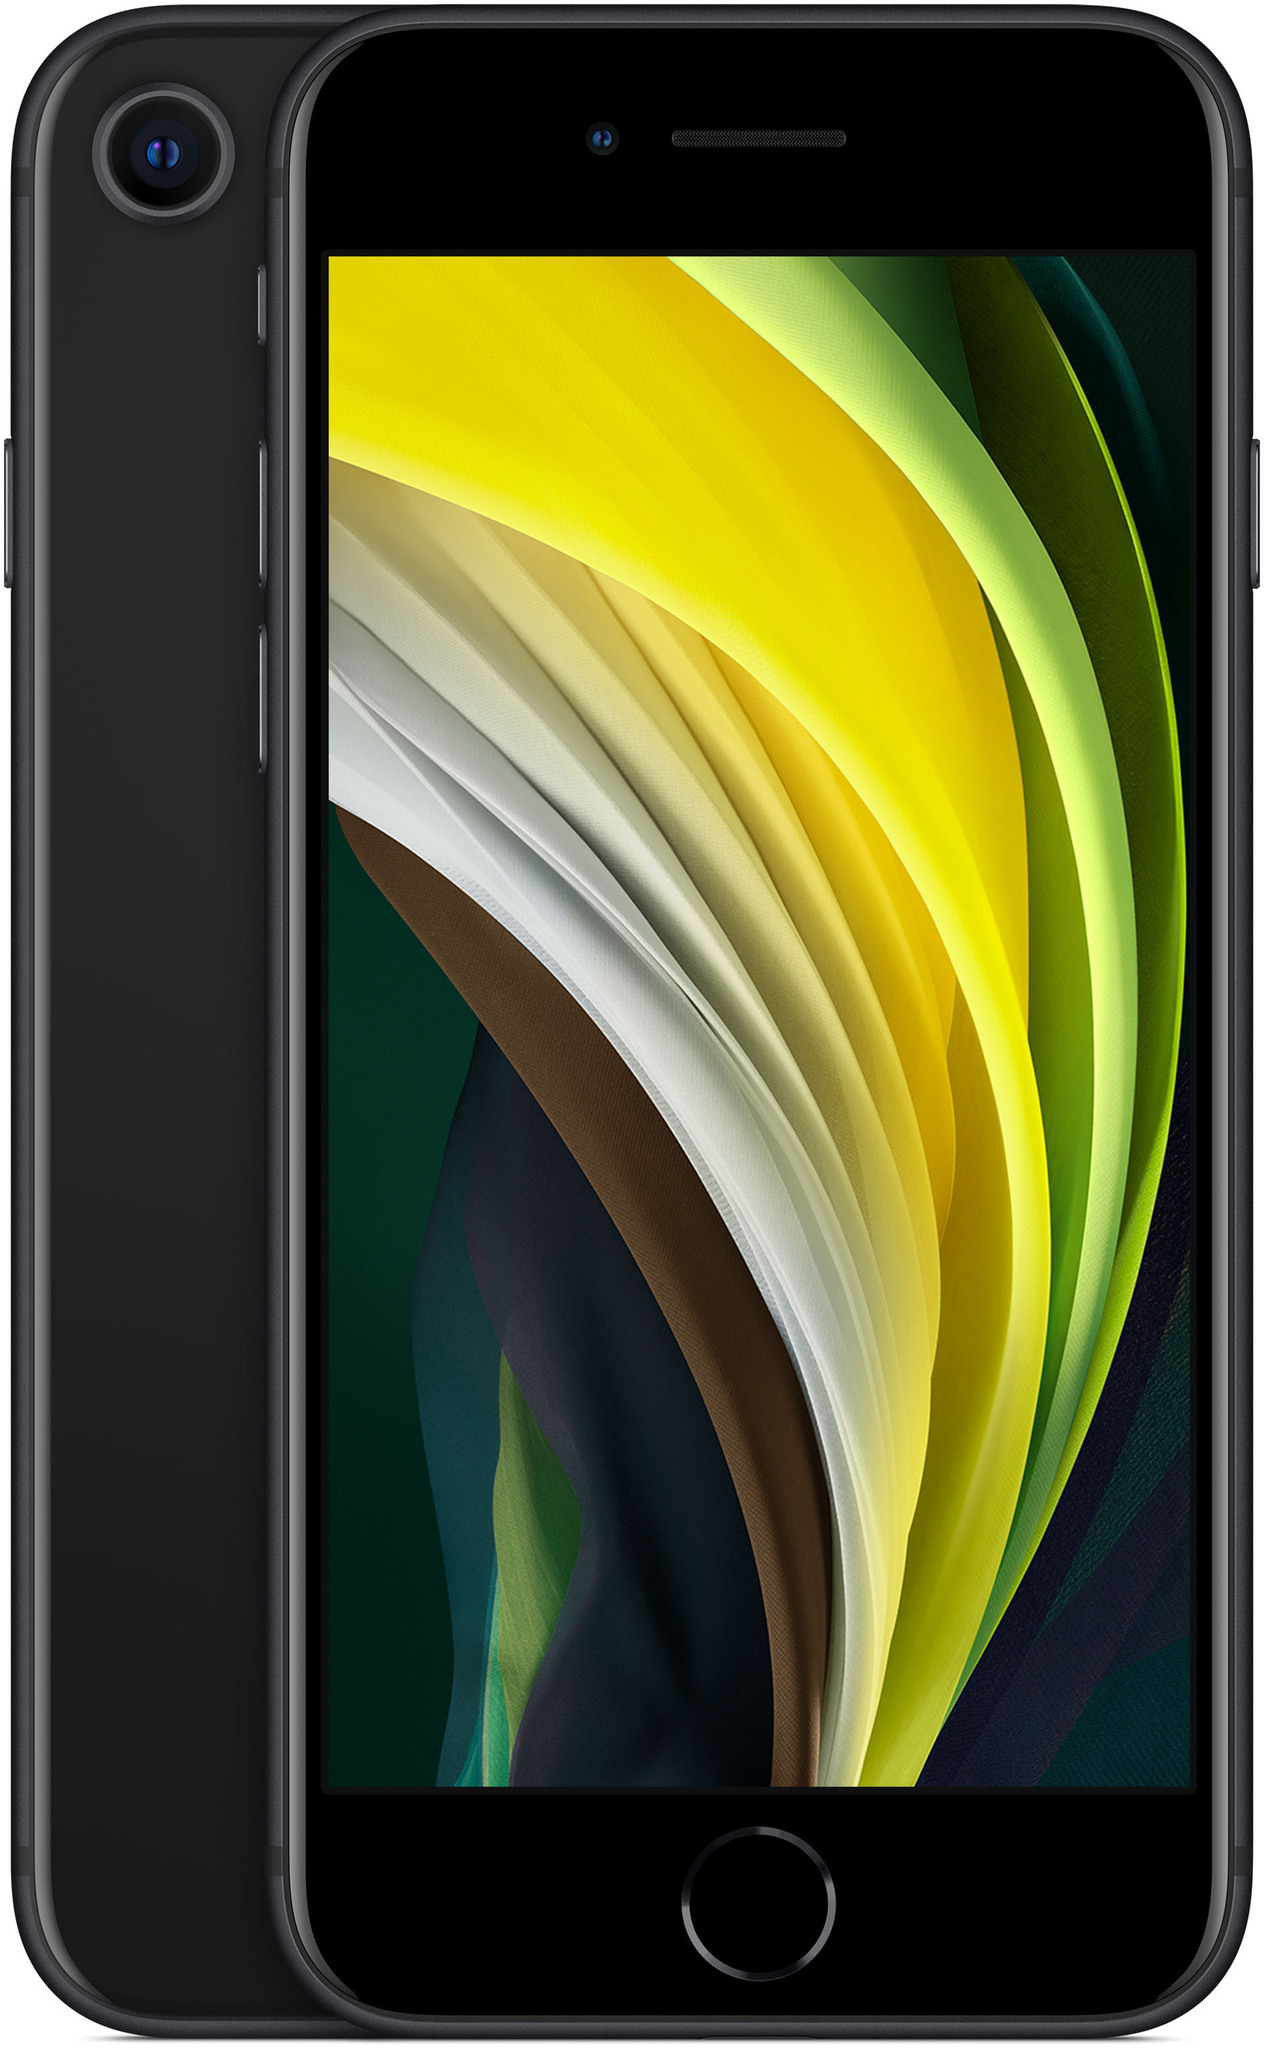 iPhone SE 2020 Apple iPhone SE 2020 64gb Черный black1.jpg